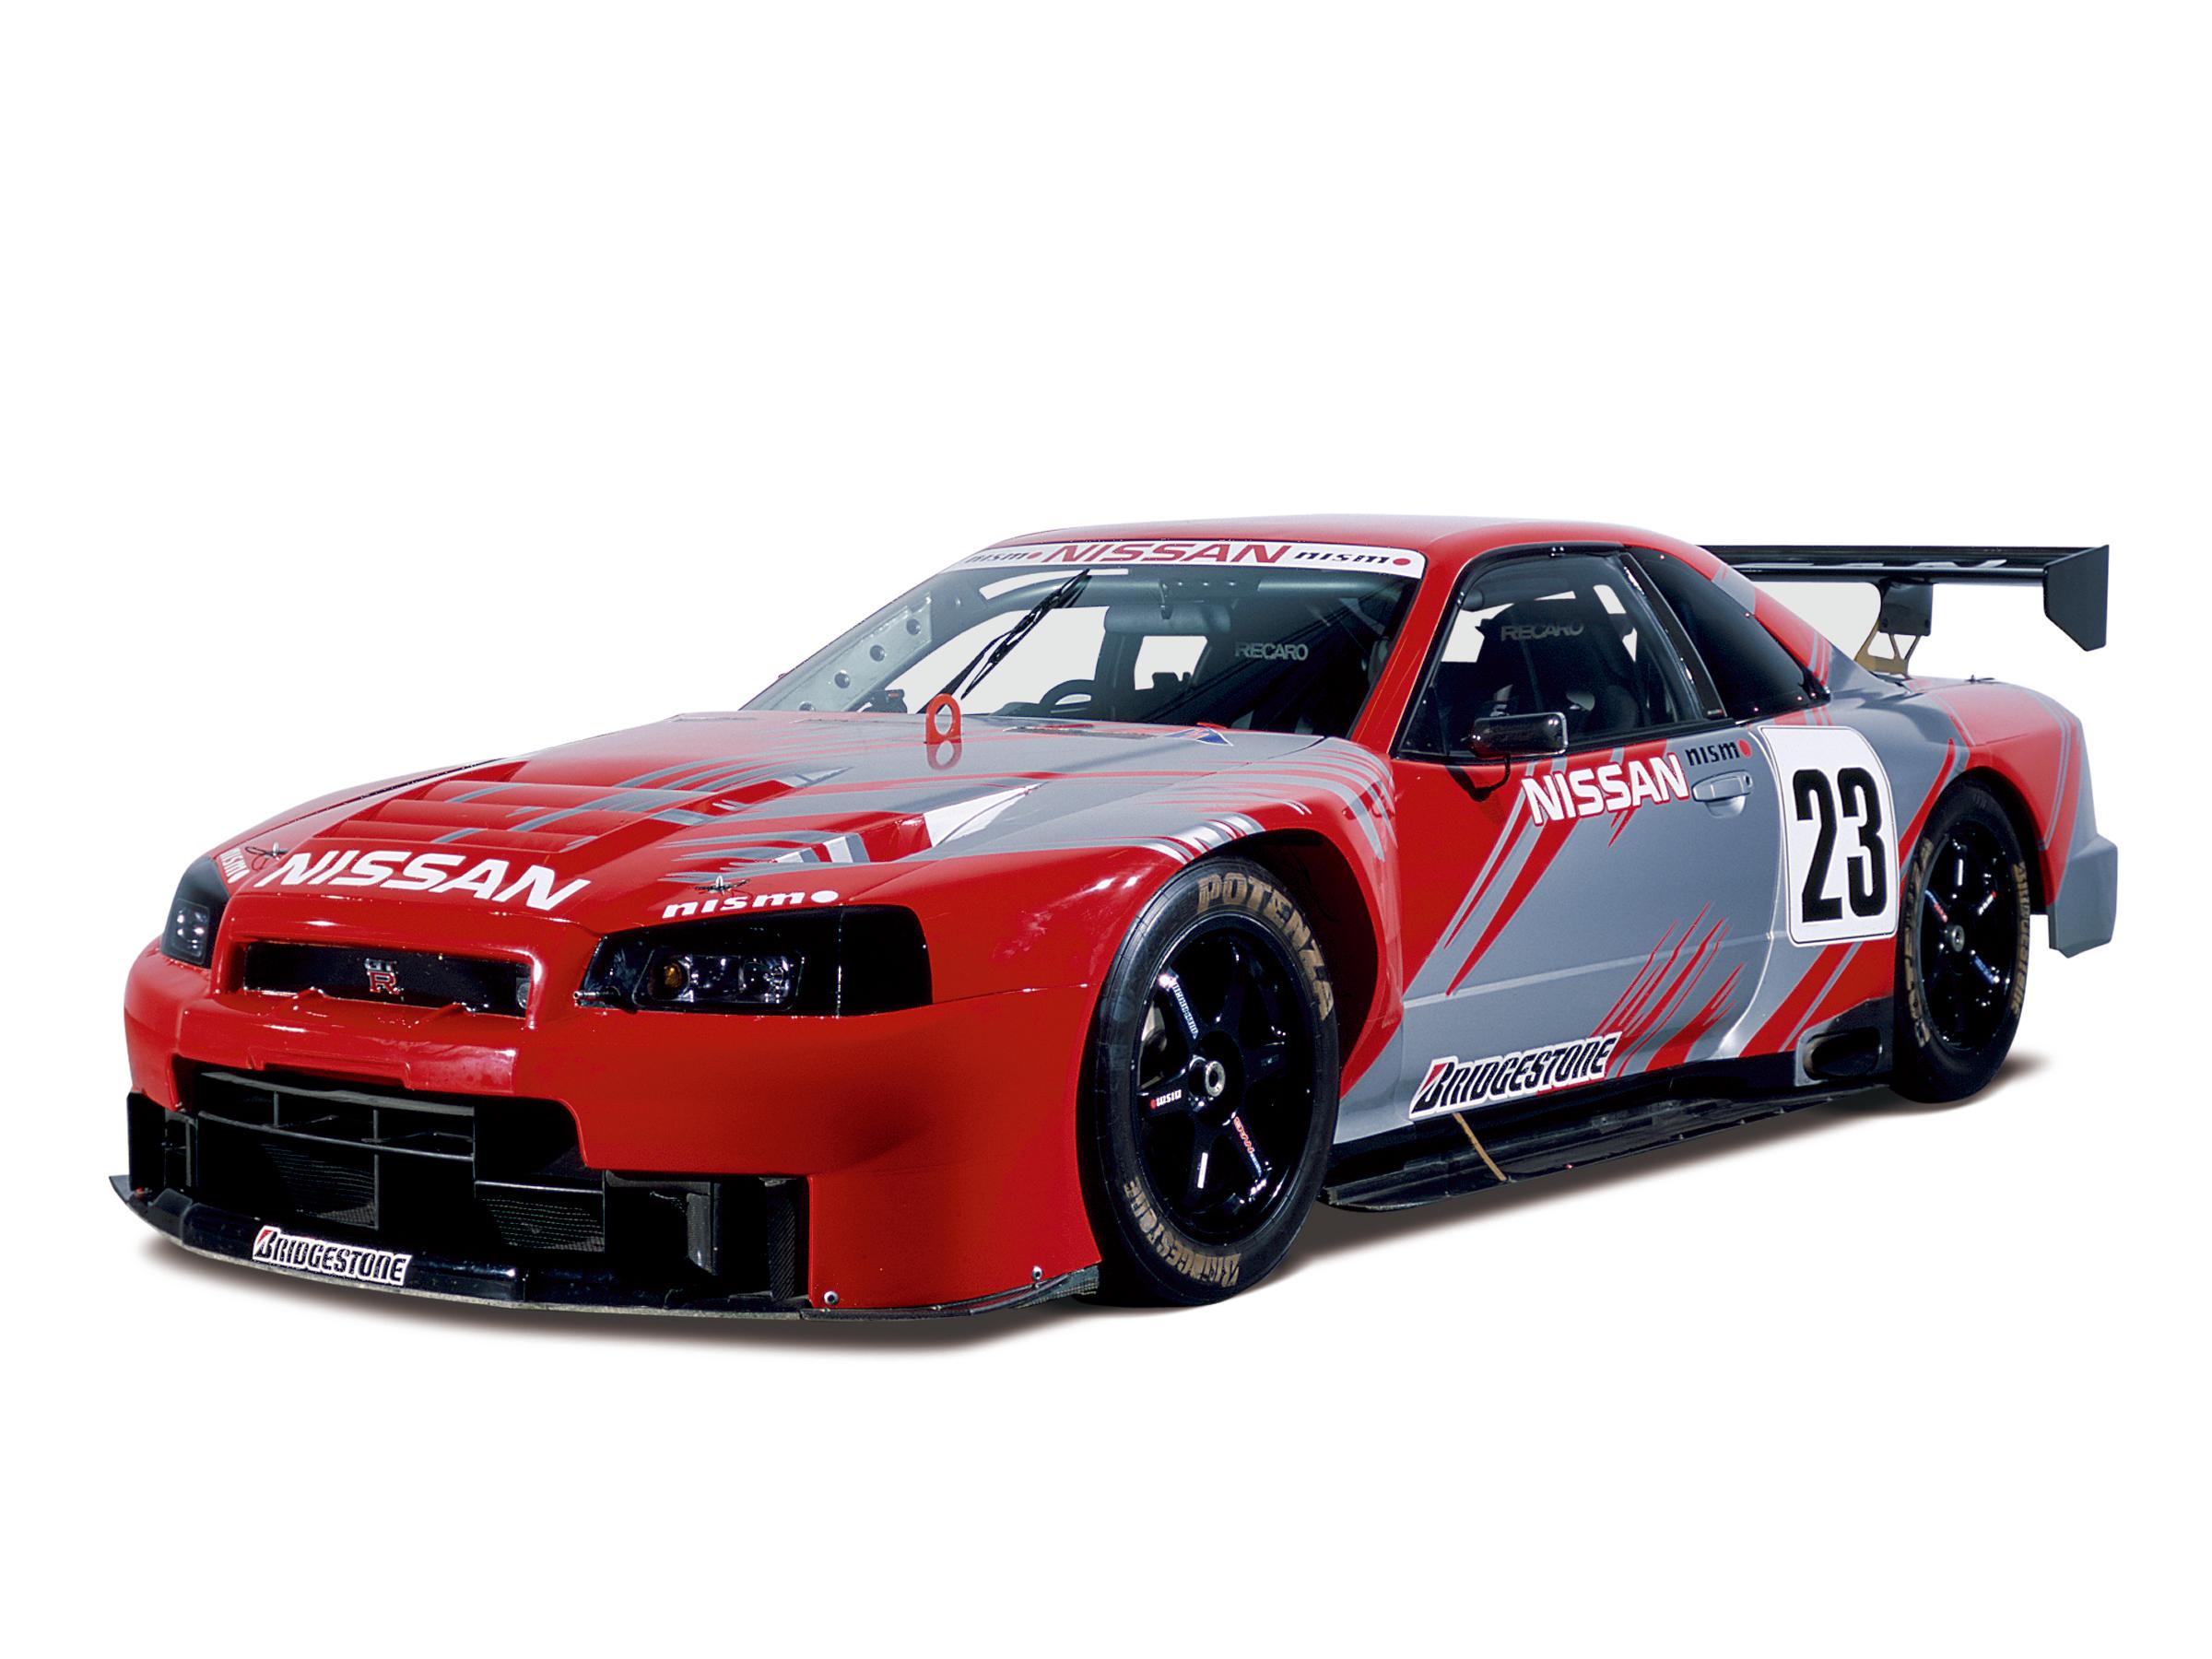 Nissan Race Car >> Nissan | Heritage Collection | Skyline GT-R